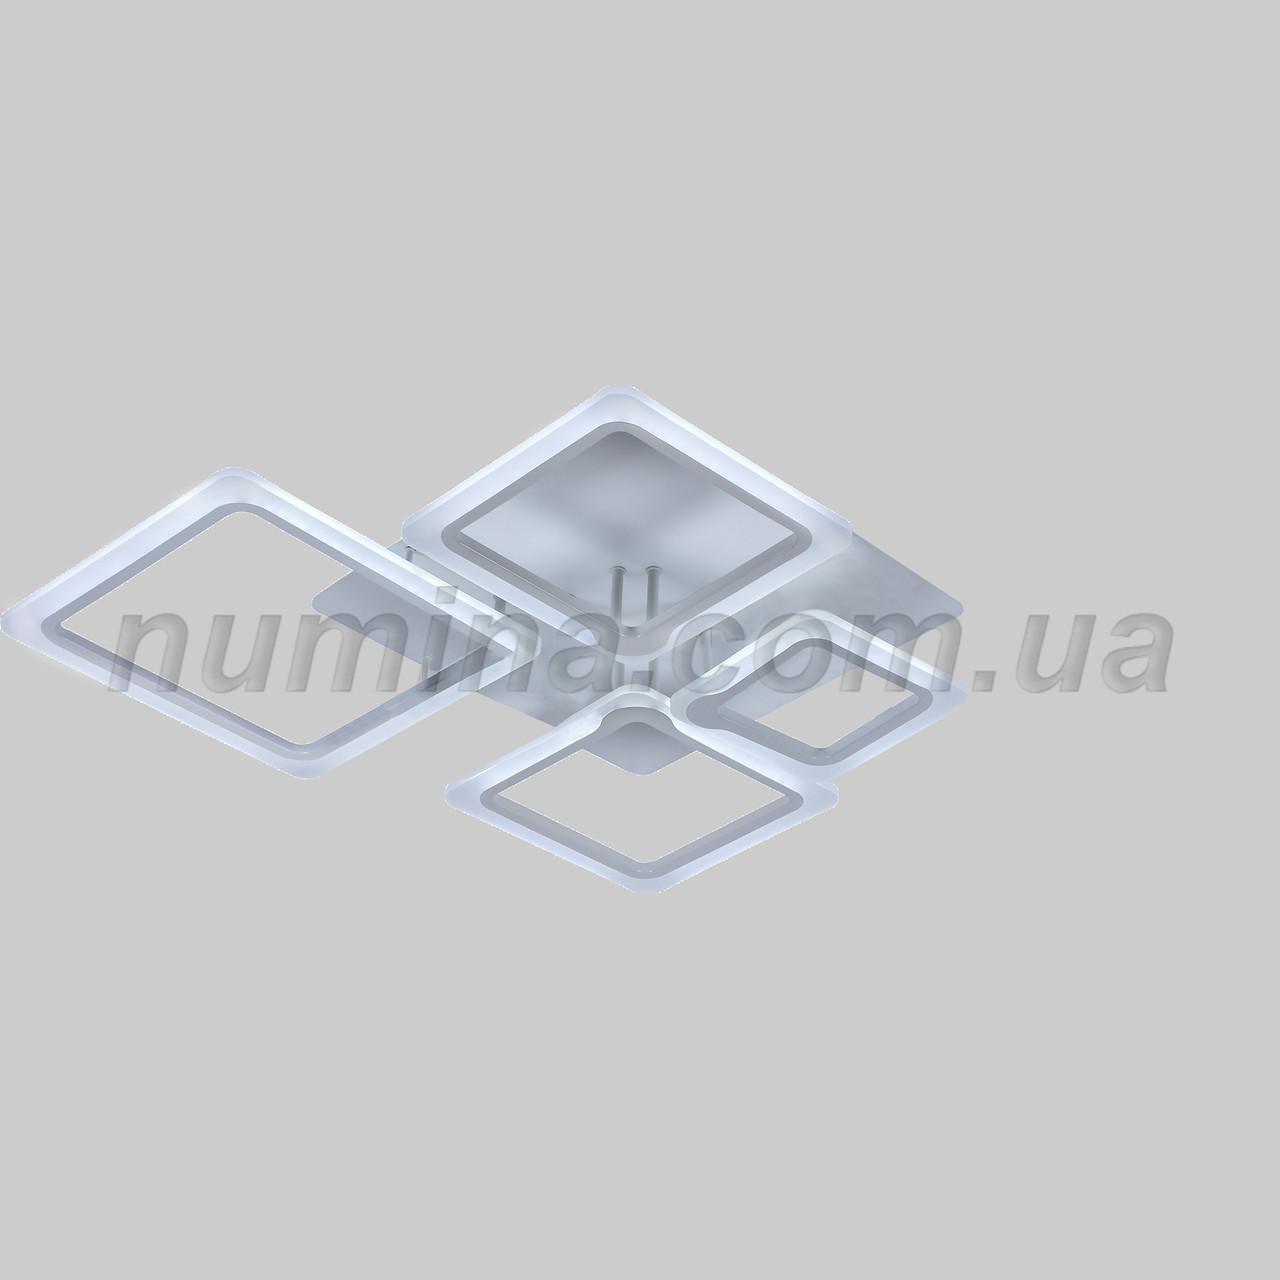 Люстра потолочная LED 20-LI8850/4B 126W WH